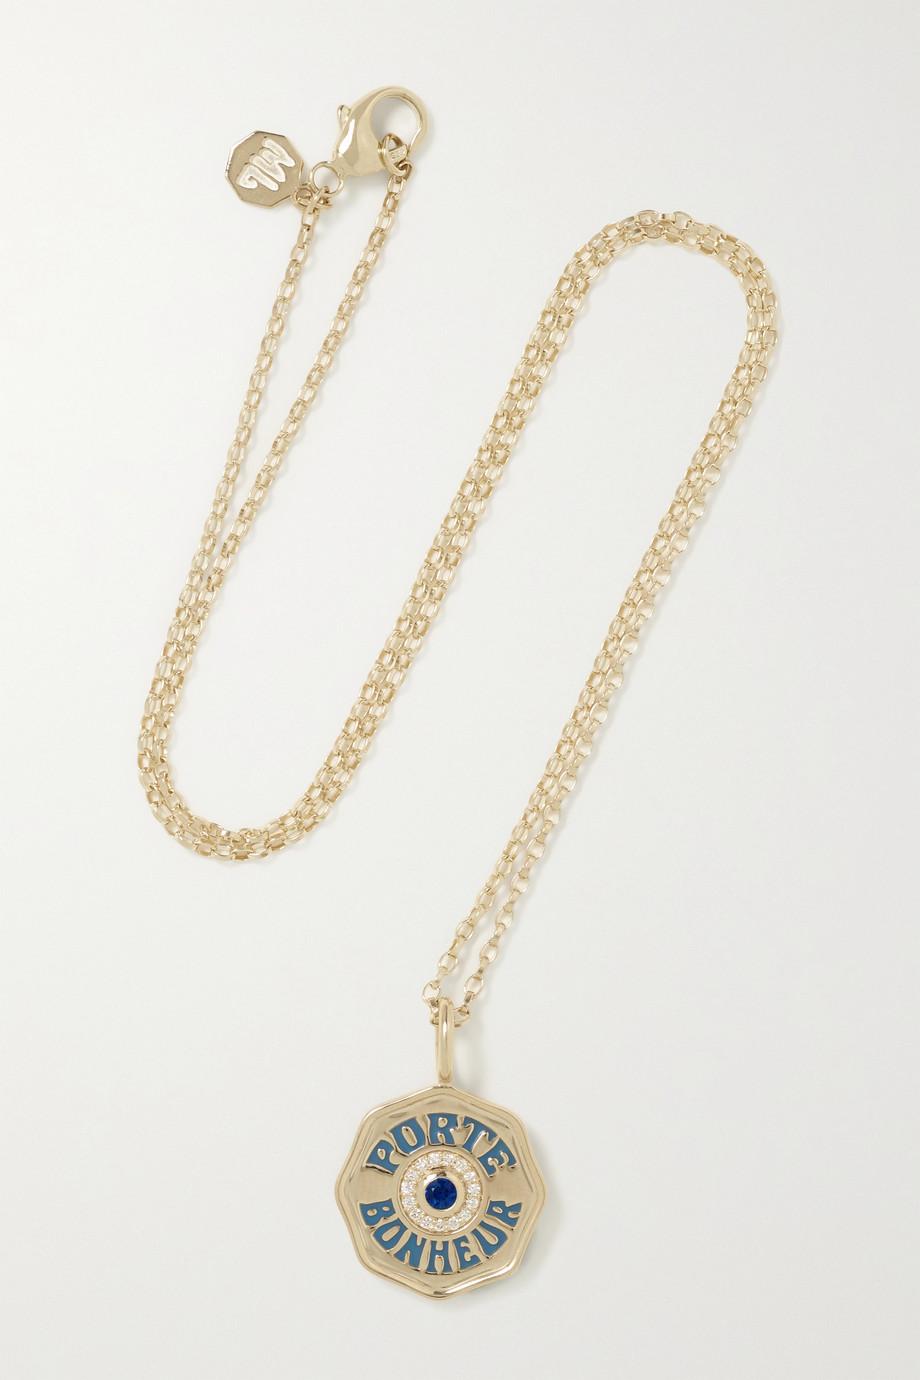 Marlo Laz Mini Porte Bonheur Coin 14-karat gold, enamel, sapphire and diamond necklace